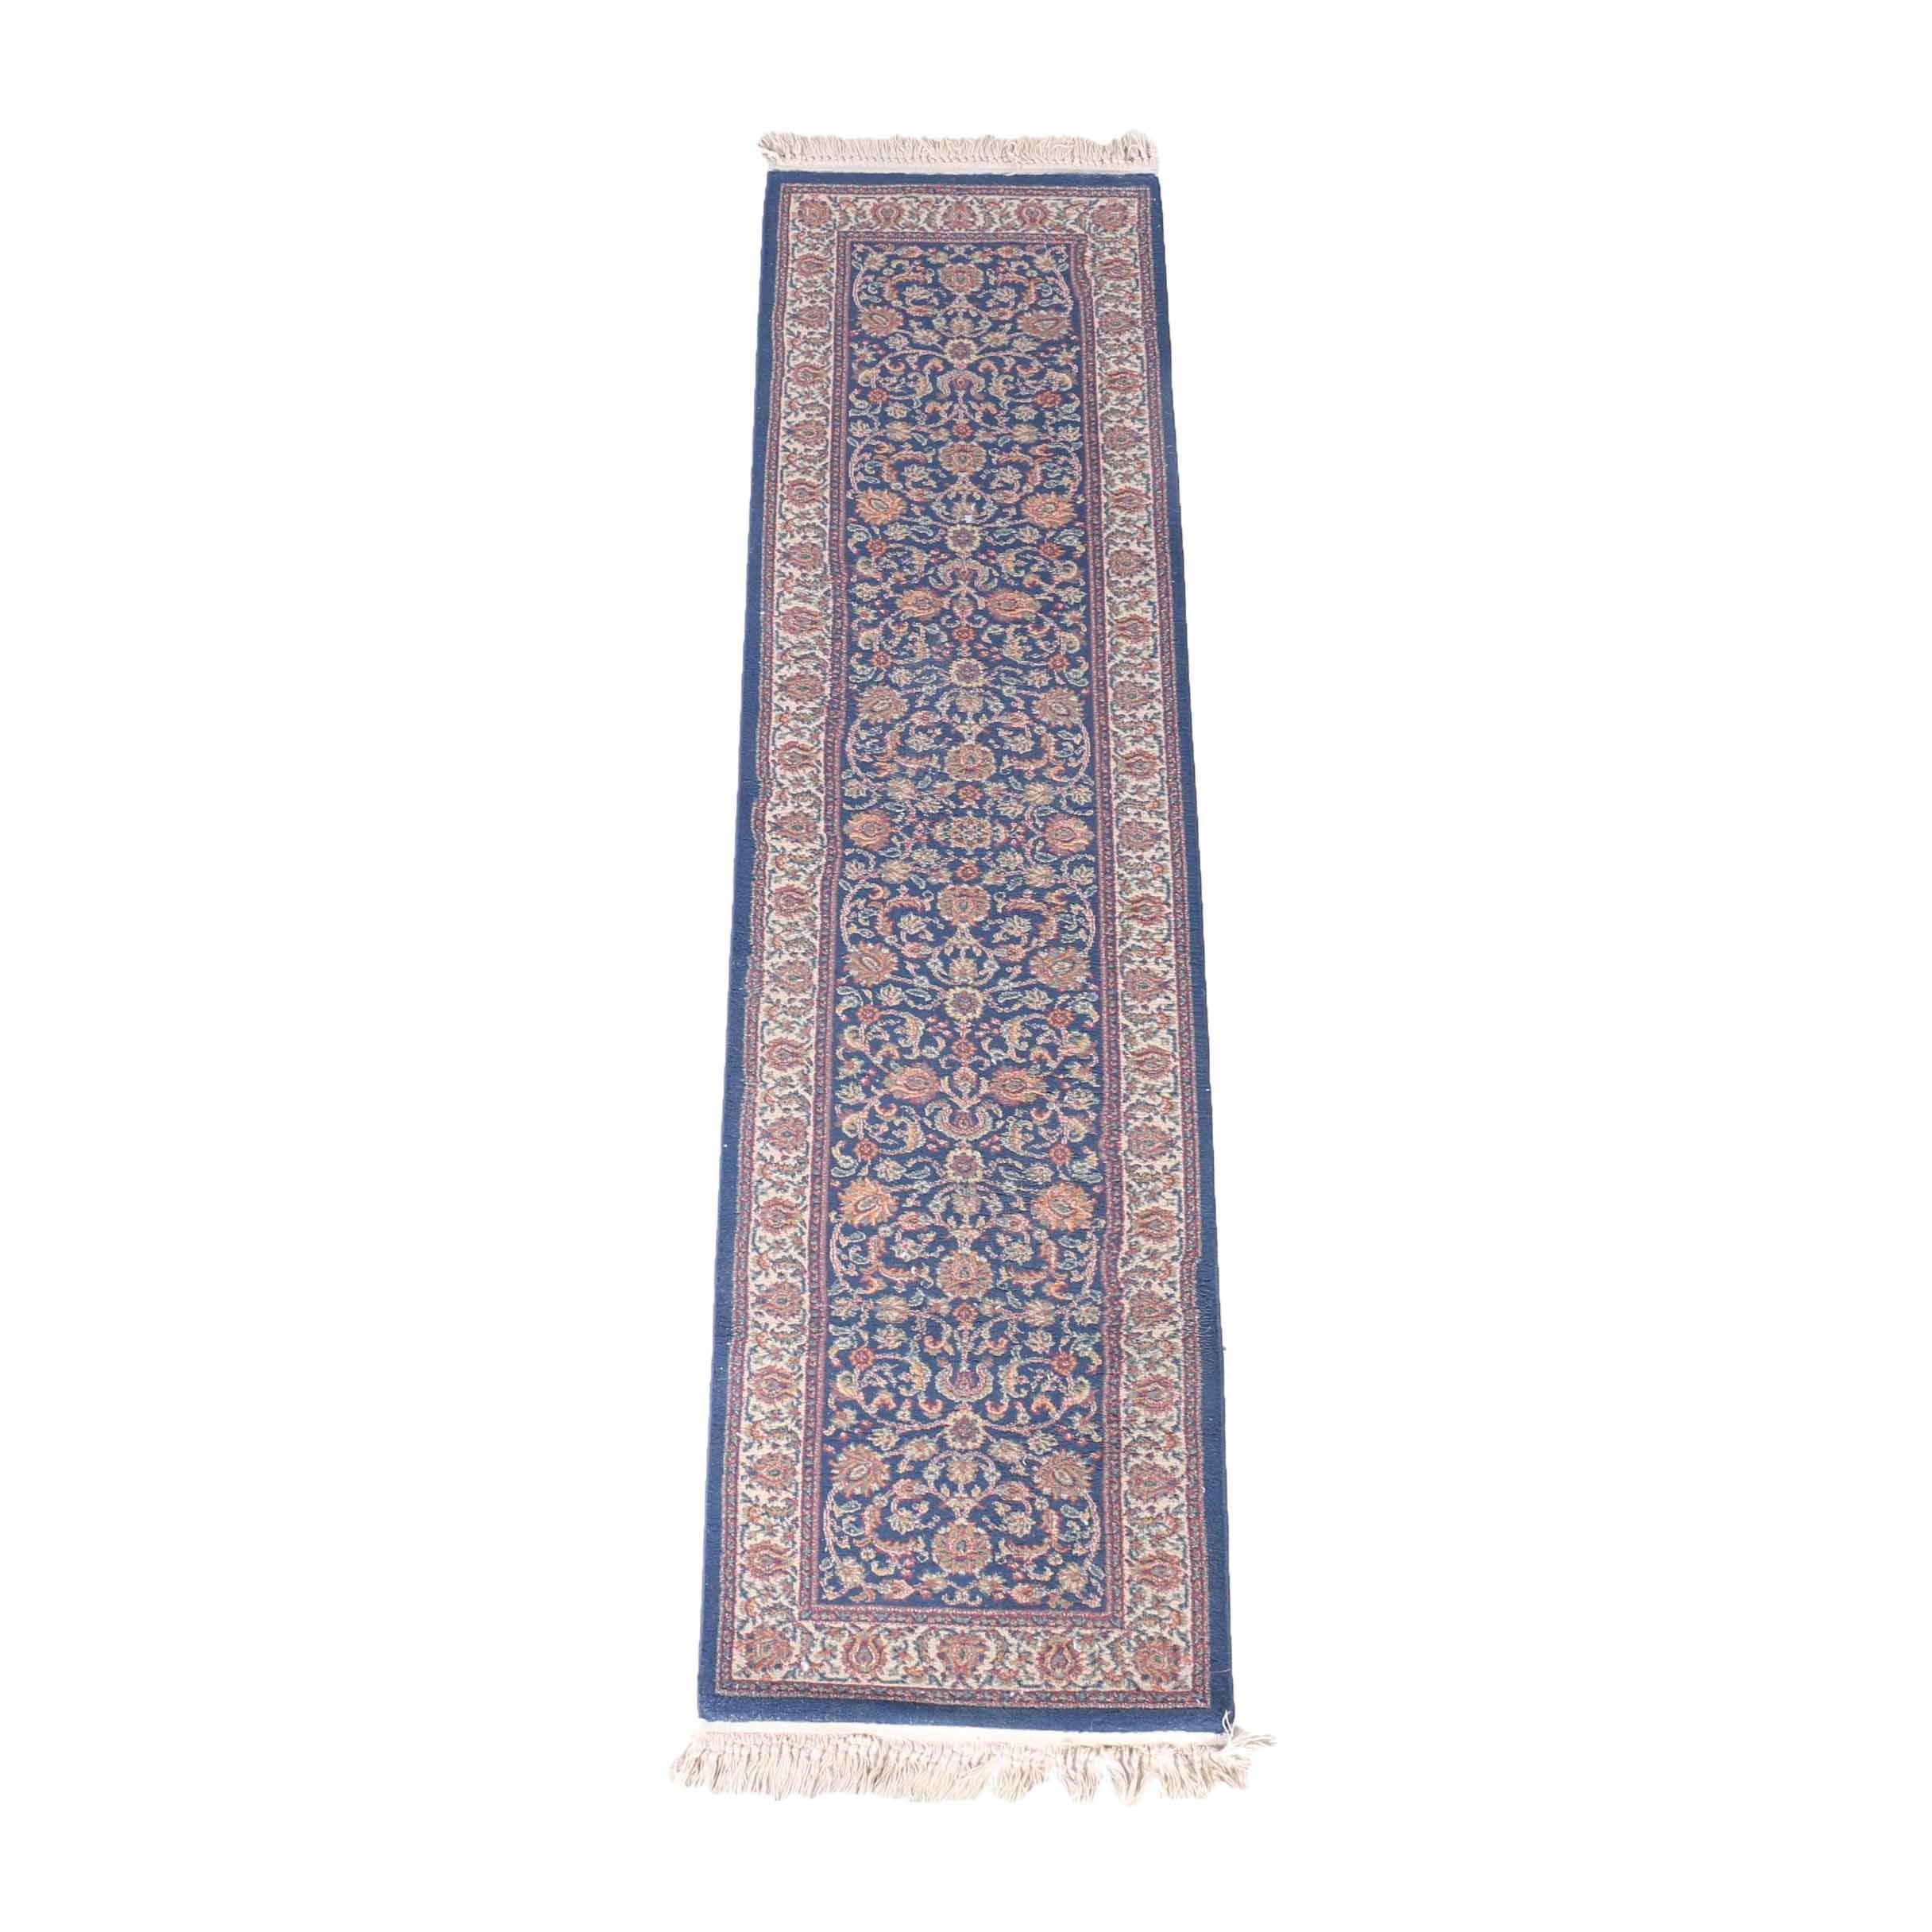 "Machine Woven Classic Treasures ""Kashan"" Carpet Runner"